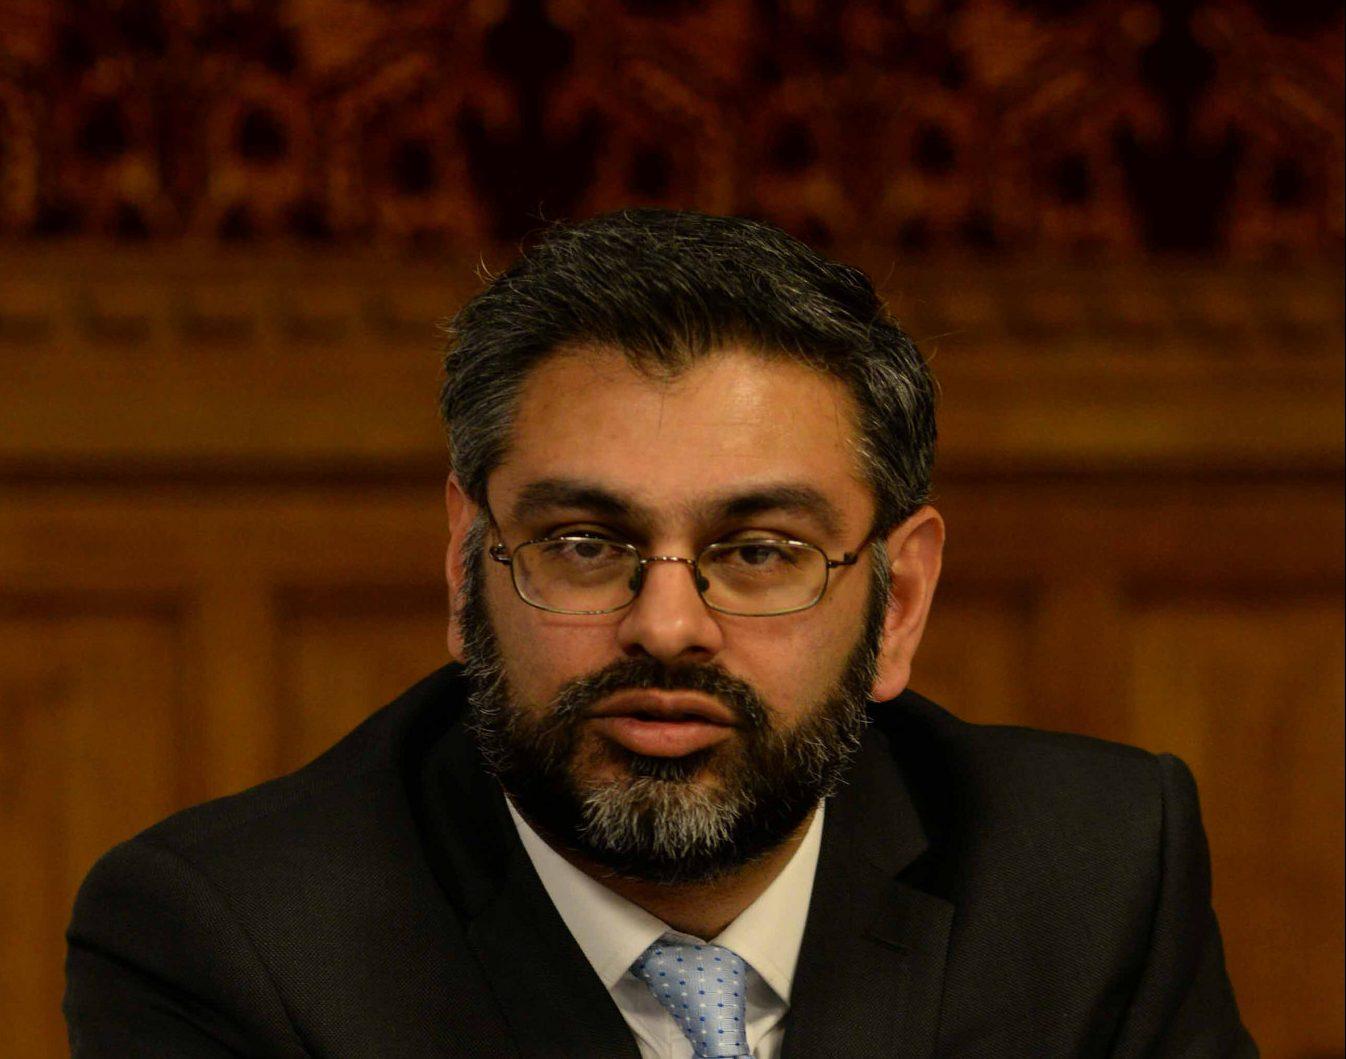 Saad Saeed